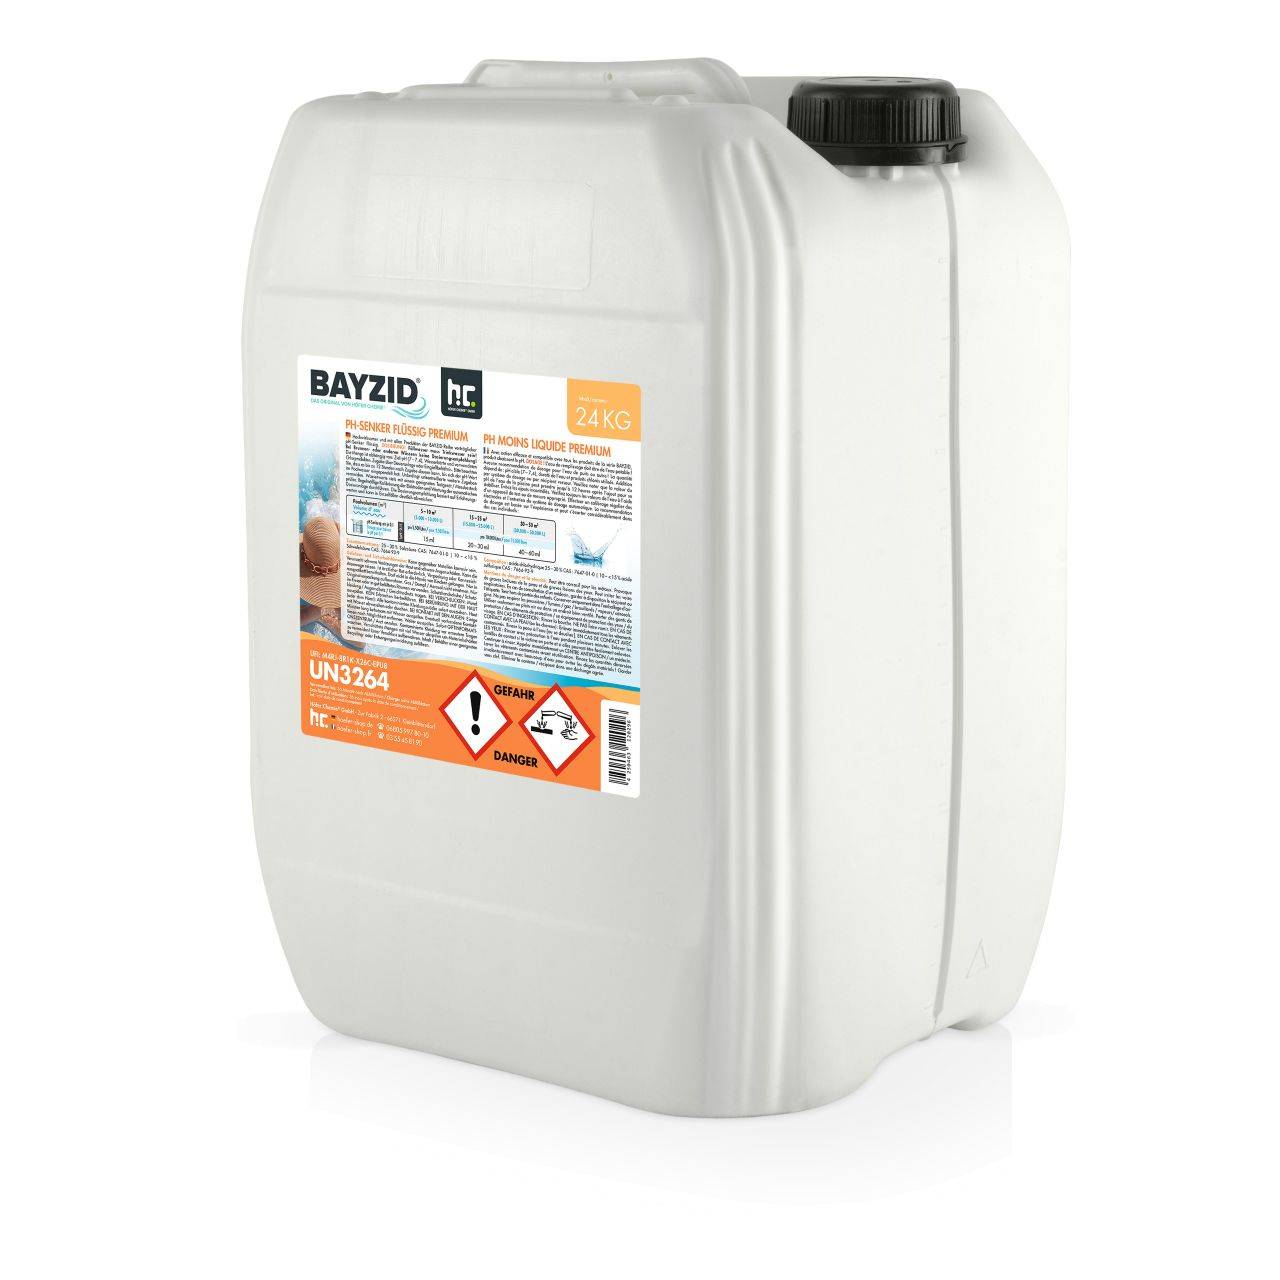 BAYZID 96 kg Bayzid® pH moins liquide (4 x 24 kg)